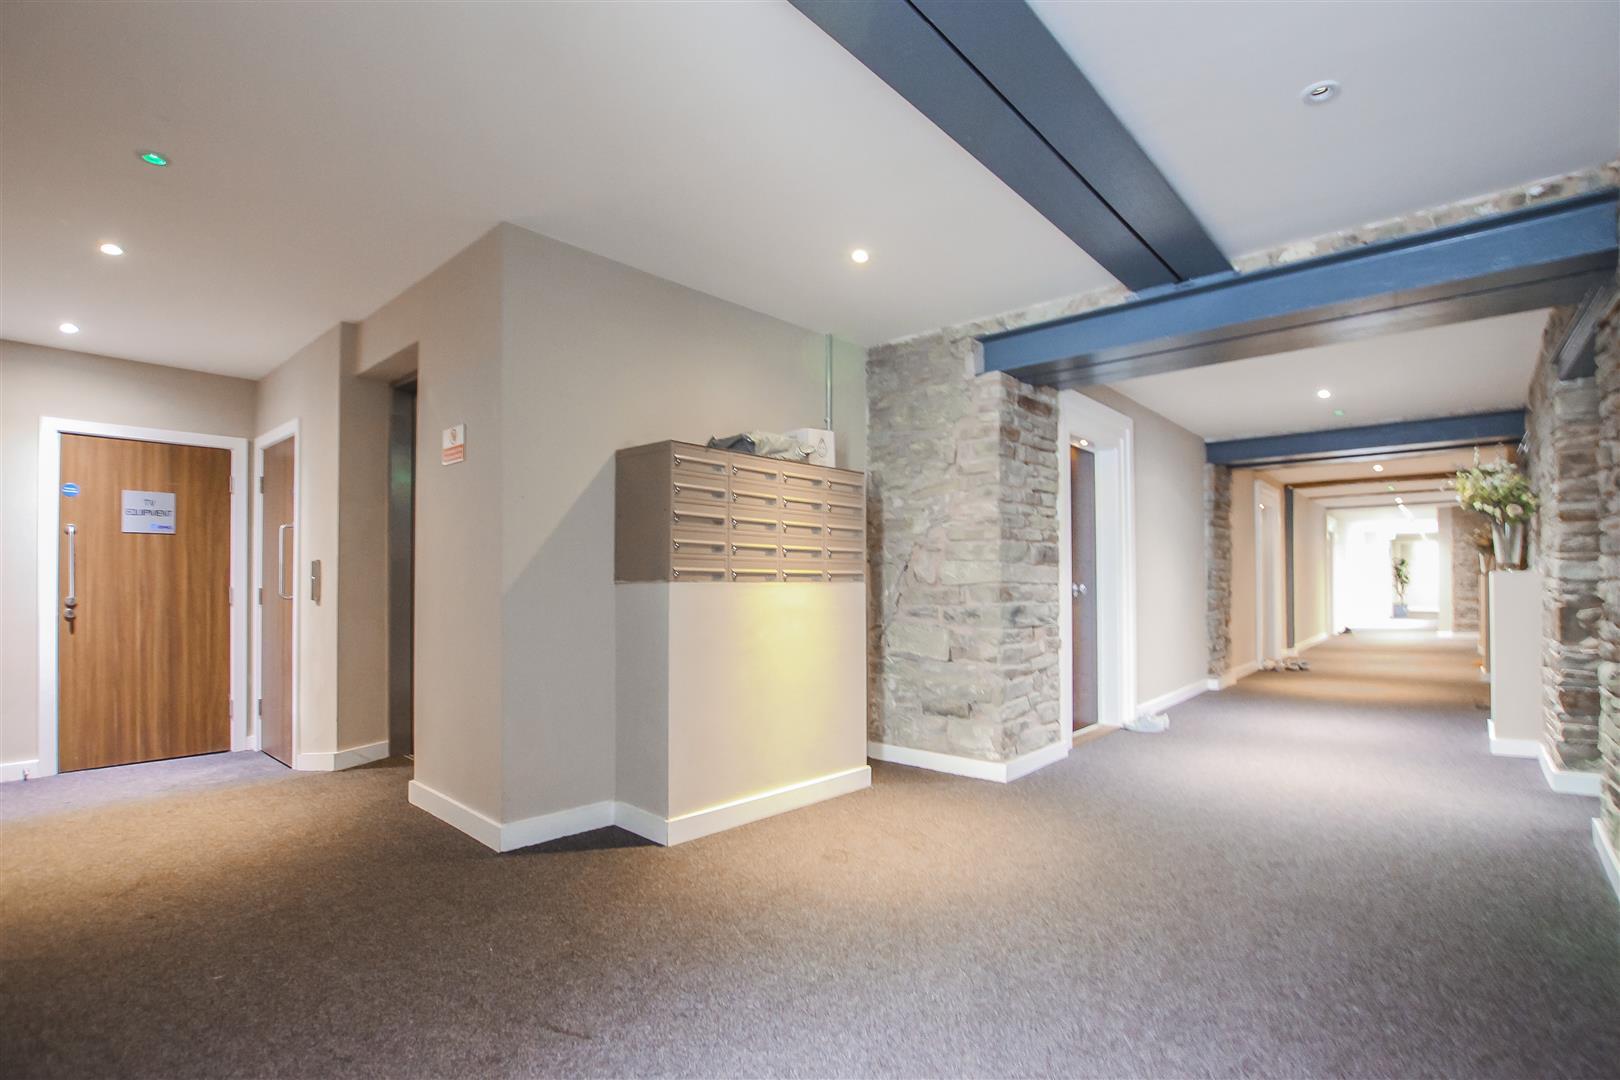 3 Bedroom Duplex Apartment For Sale - Image 60